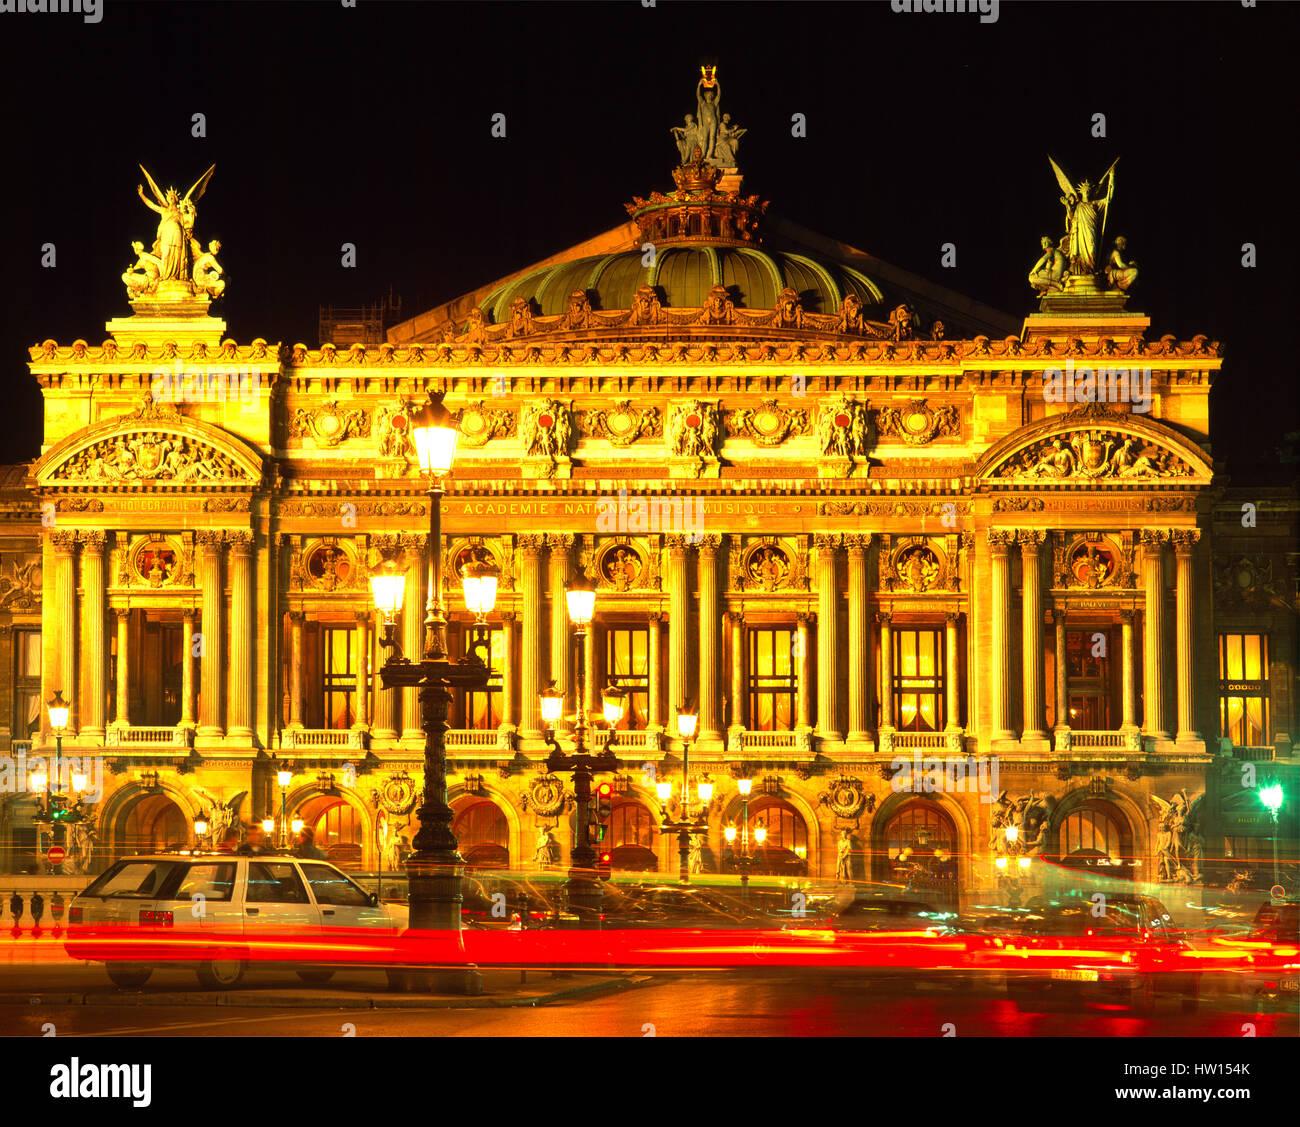 Opera Garnier at night, Paris, France - Stock Image